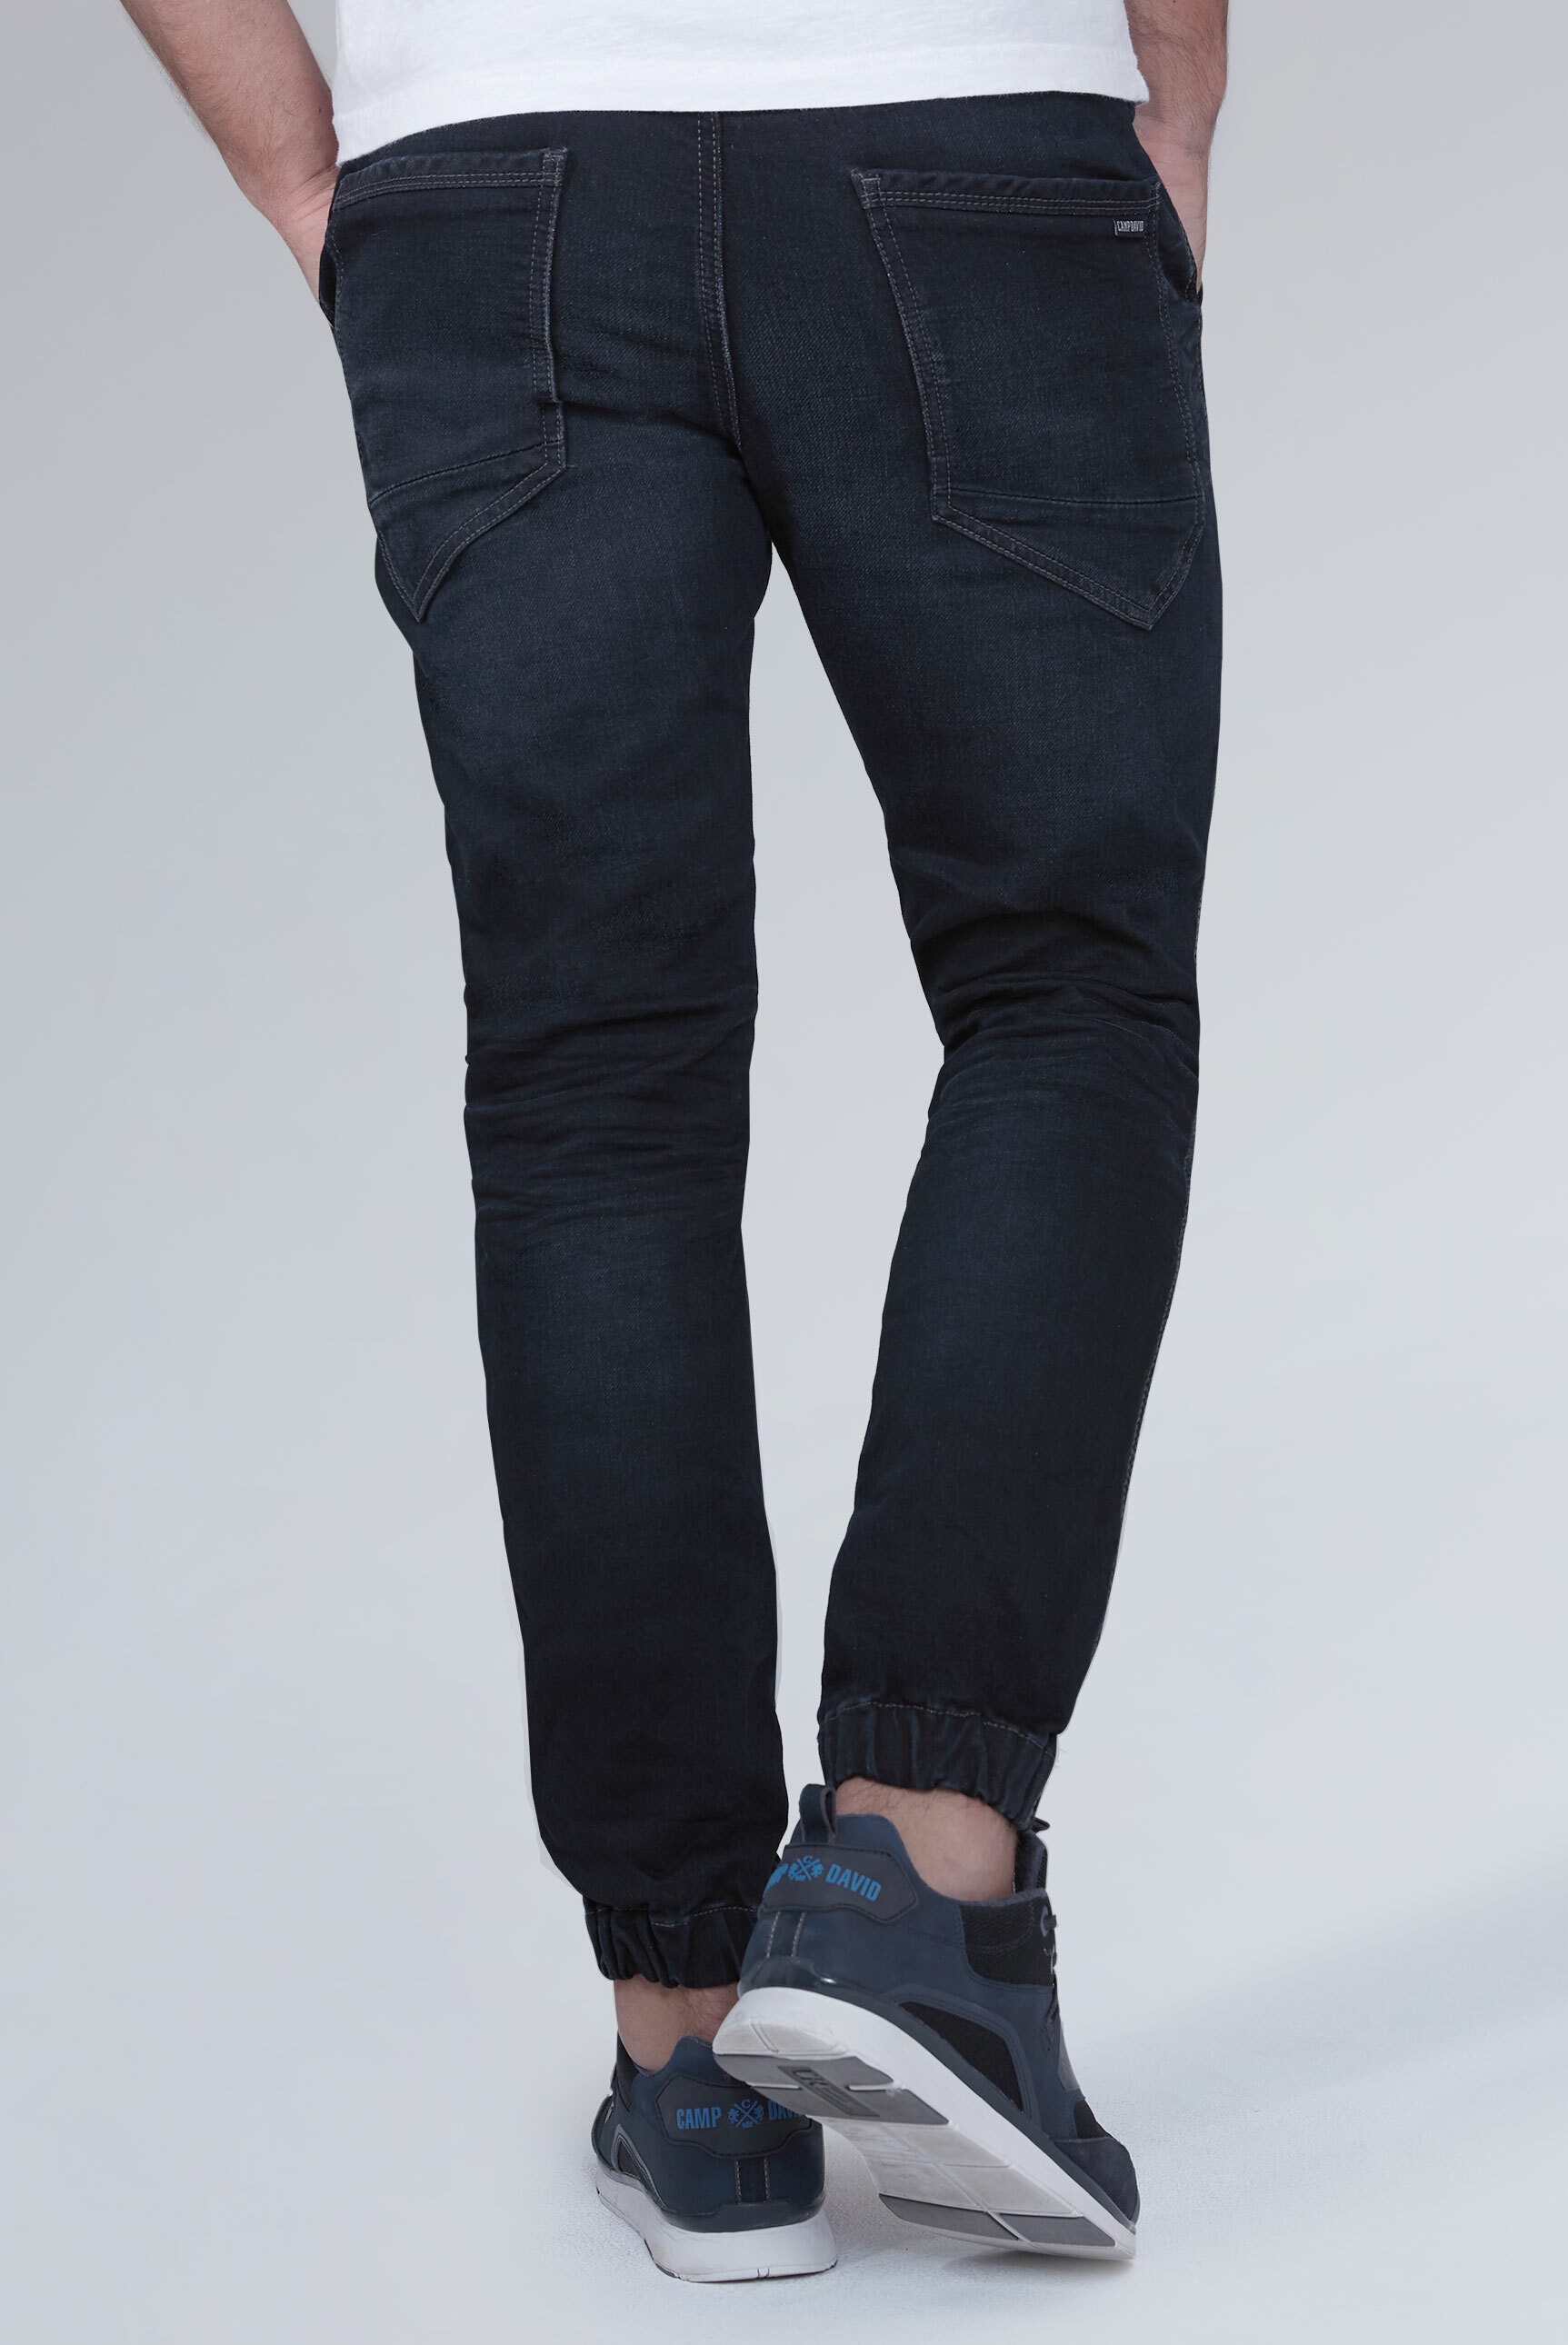 Jeans RO:B aus Jogg Denim